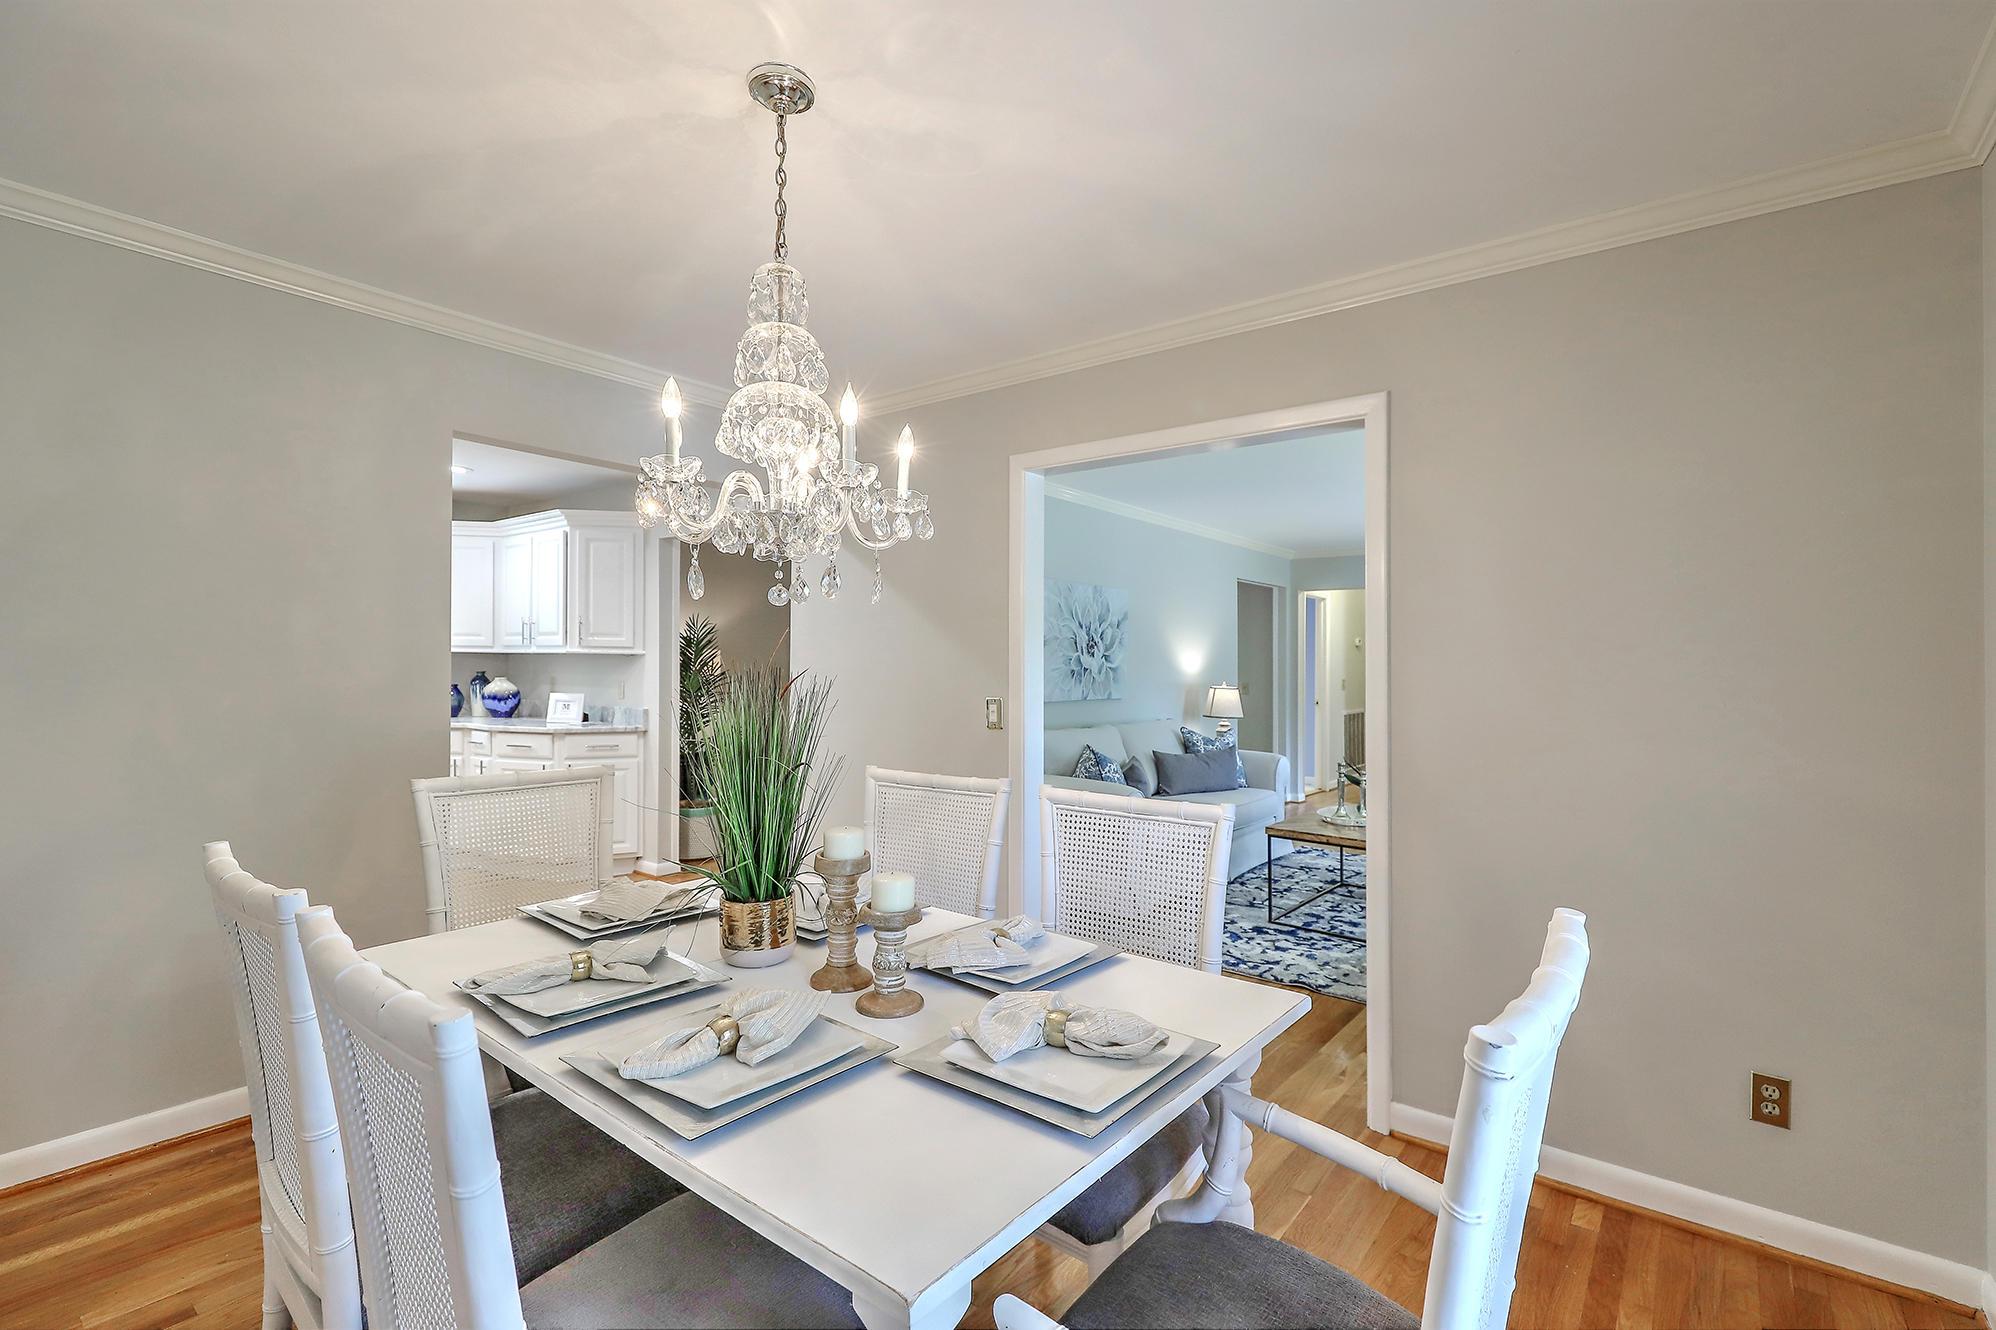 Charlestowne Estates III Homes For Sale - 1313 Coleridge, Charleston, SC - 10